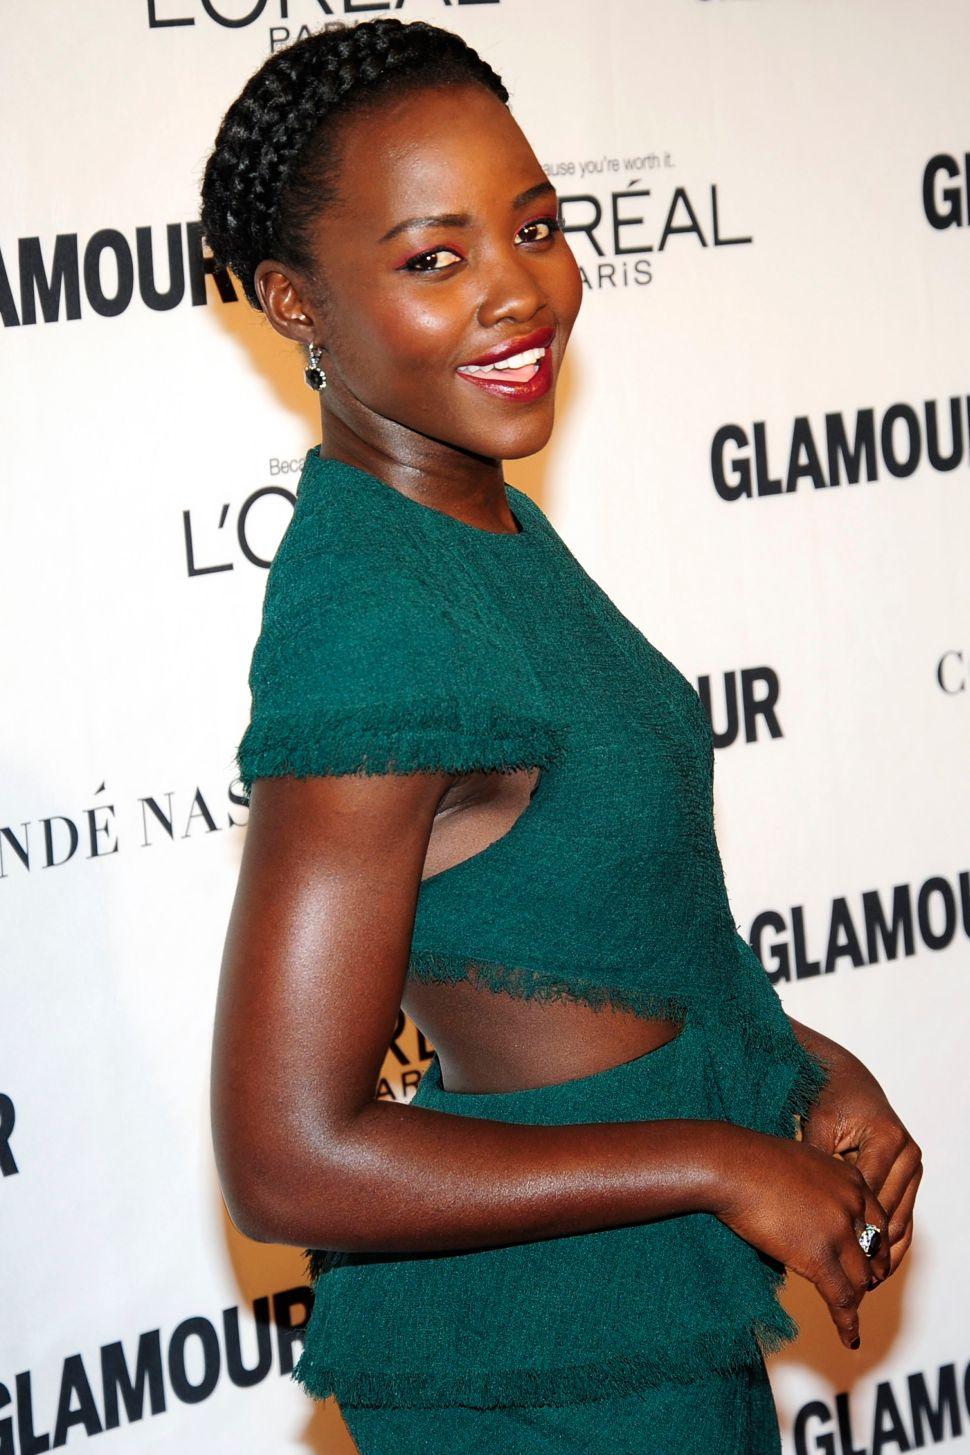 Lupita Nyong'o (Photo: Paul Bruinooge for Patrick McMullan).